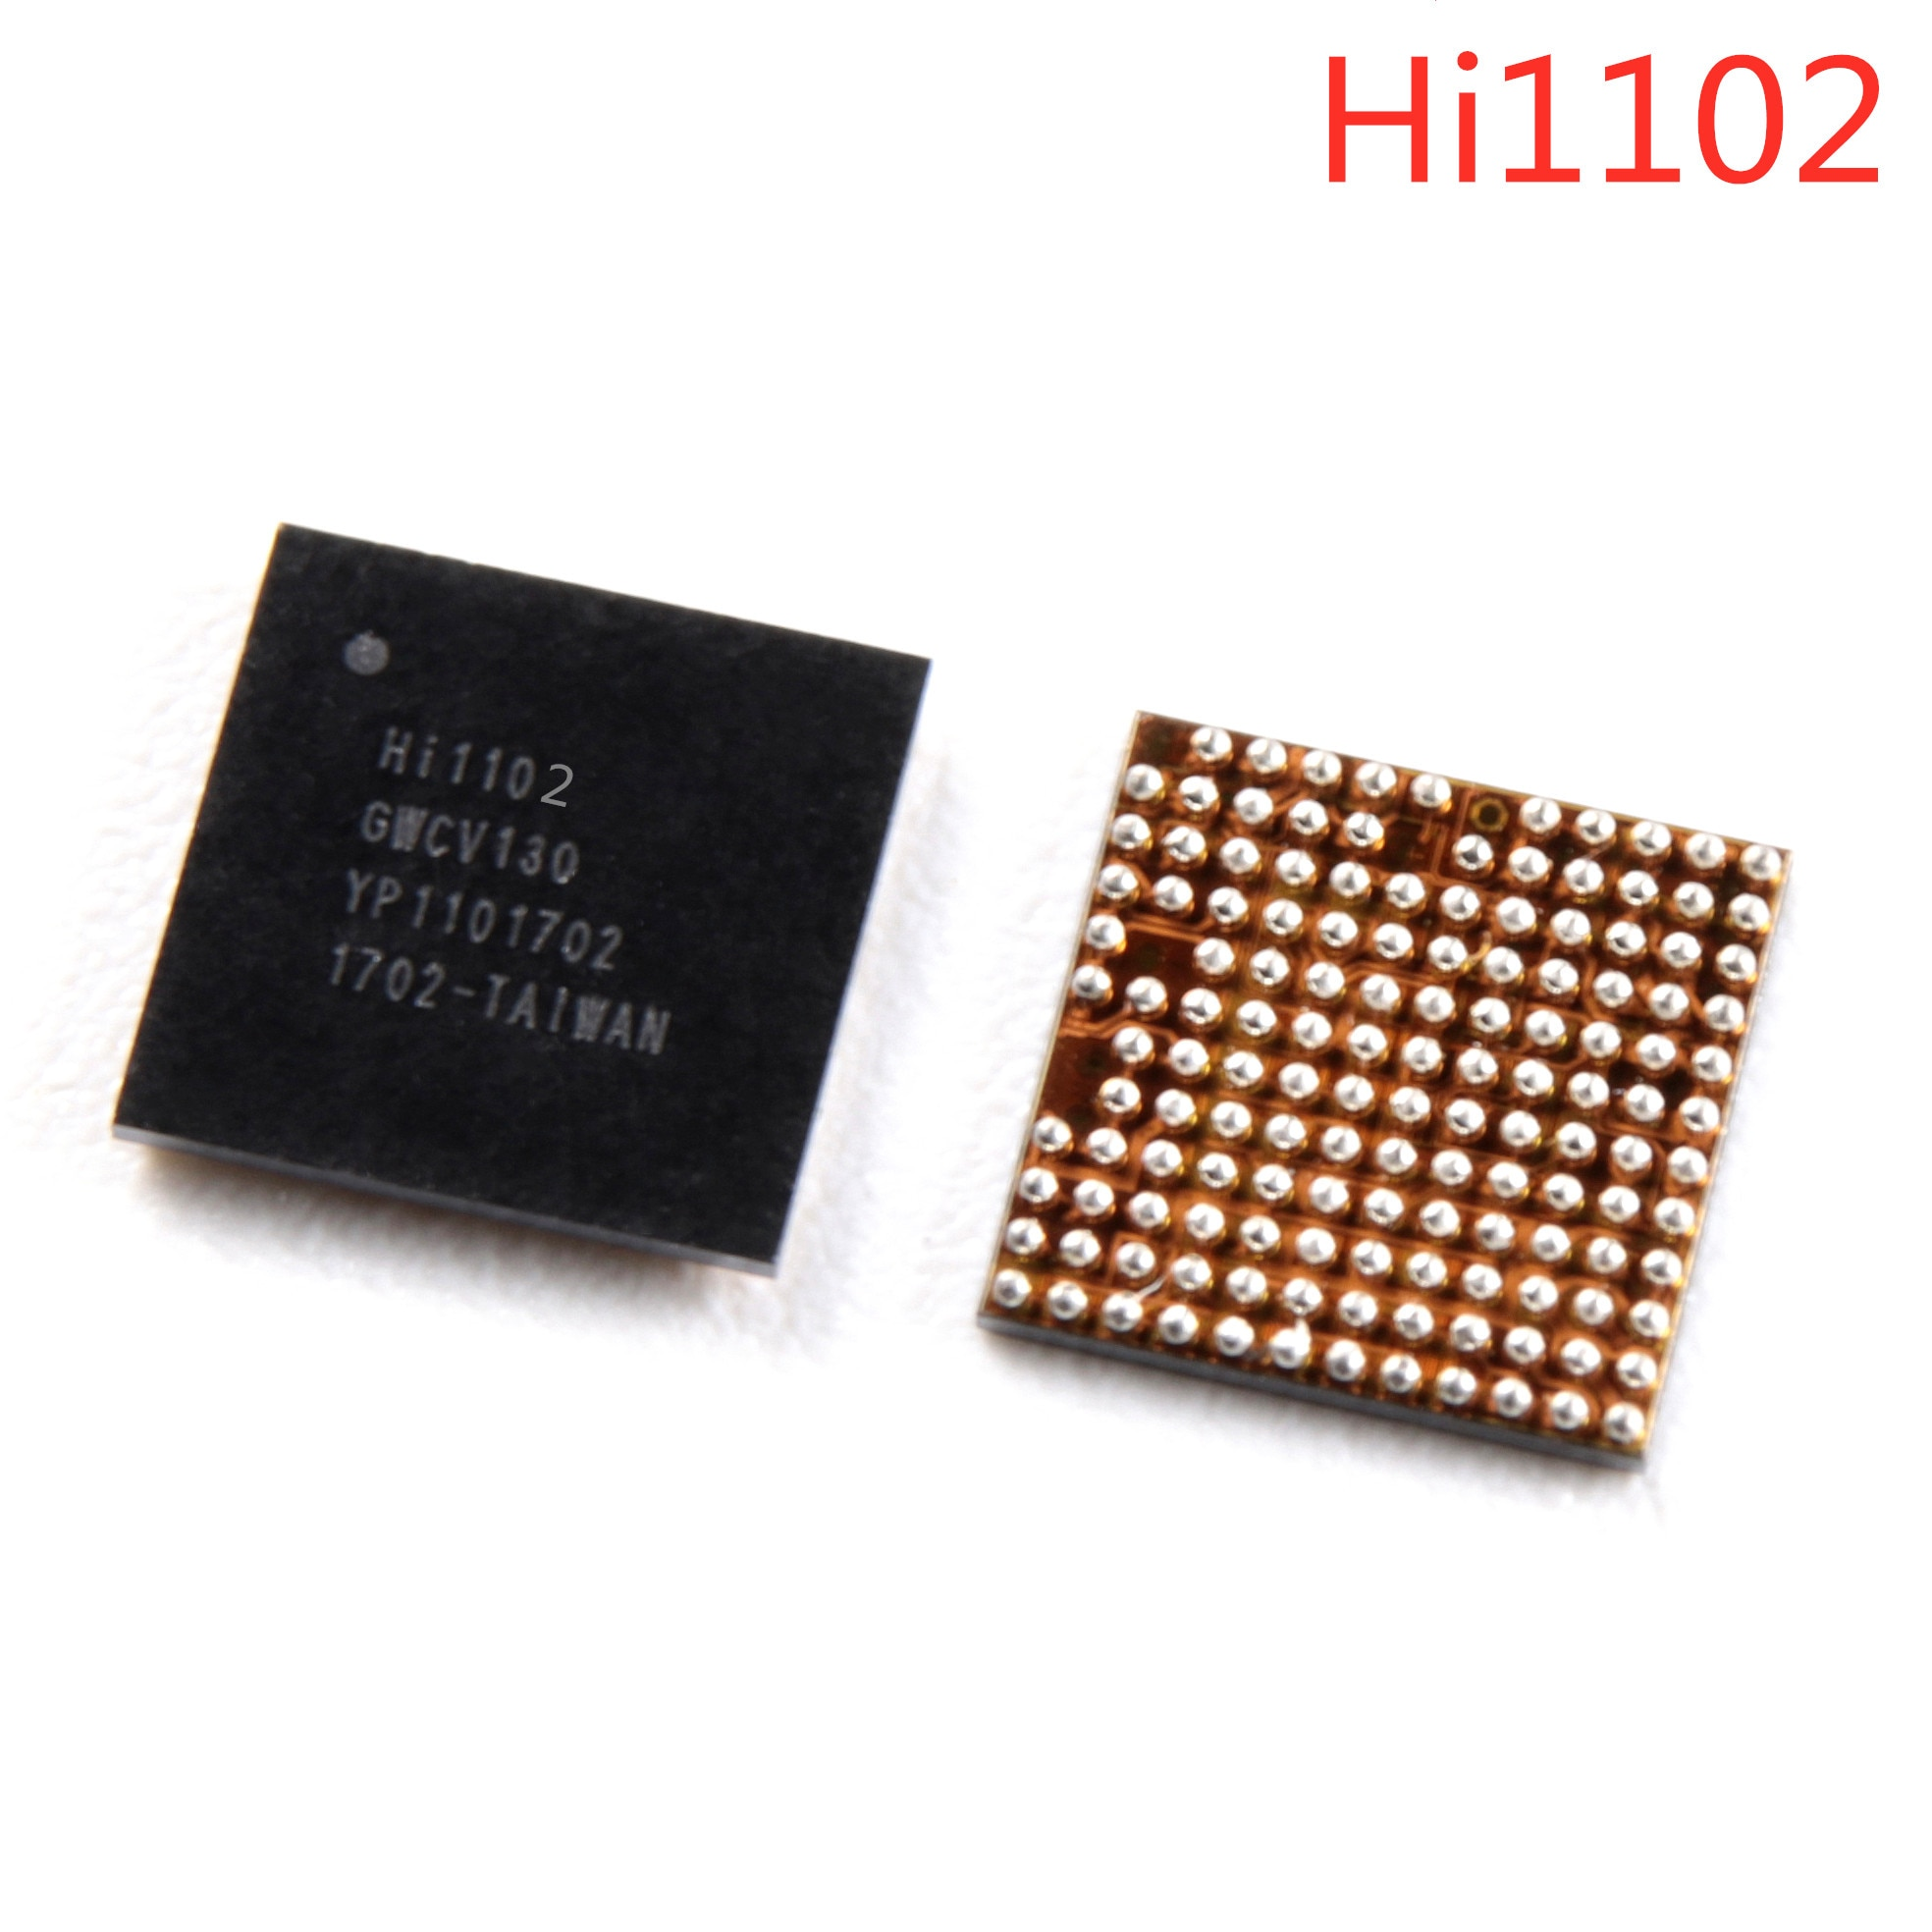 Hi1102 telefone móvel circuitos integrados wi-fi módulo ic chip